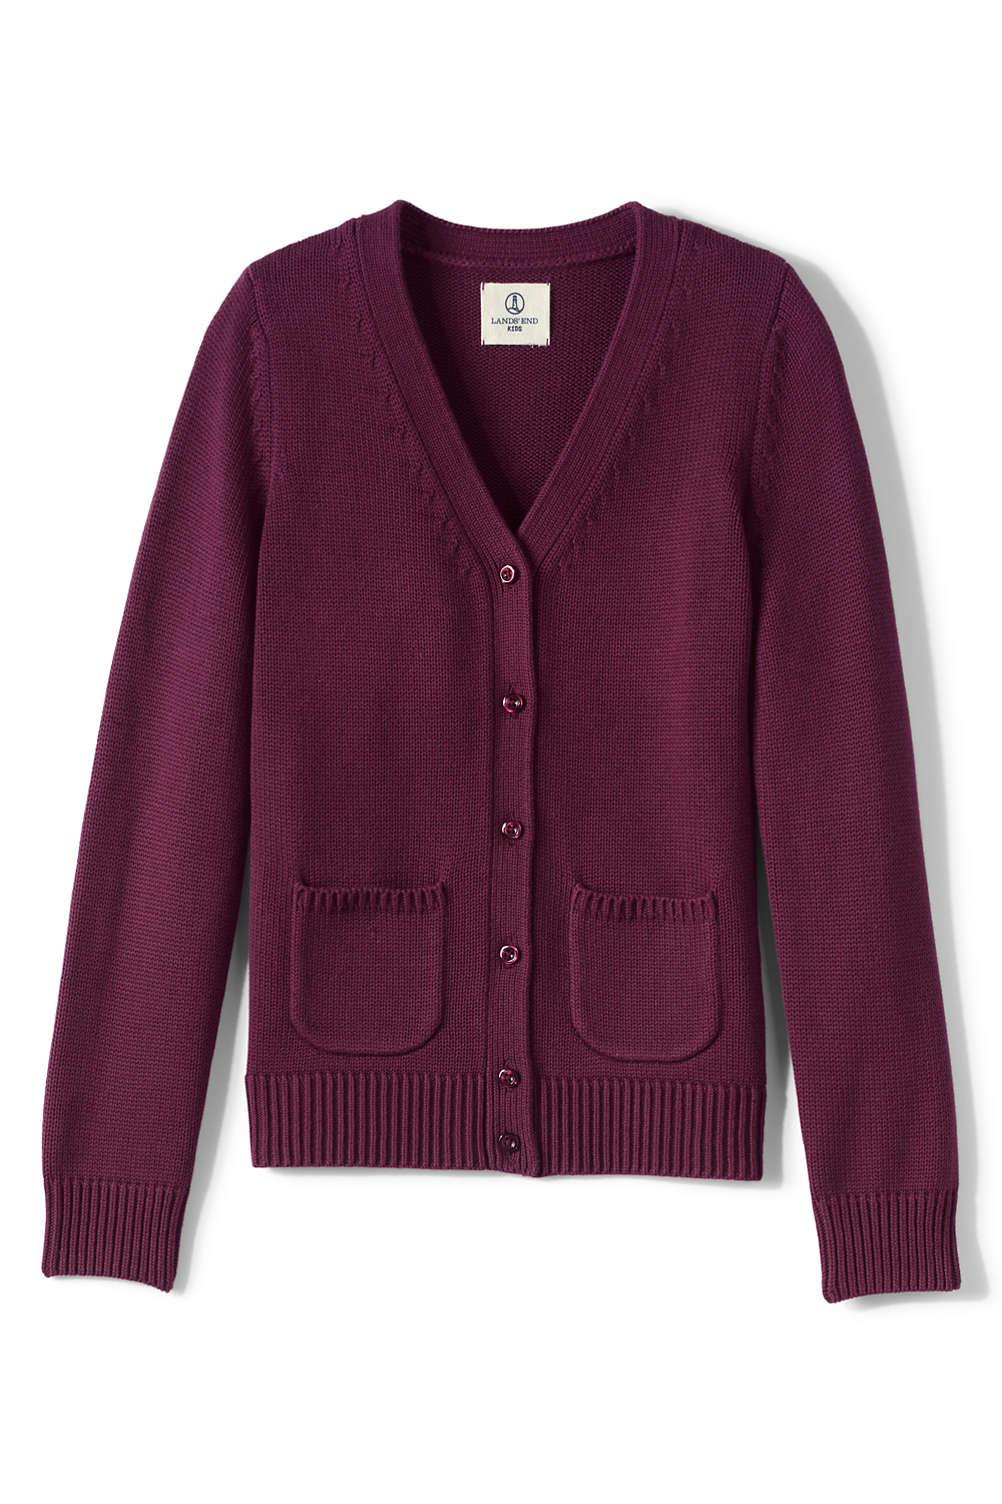 b54668946cb School Uniform Girls Cotton Modal Button Front Cardigan Sweater from ...